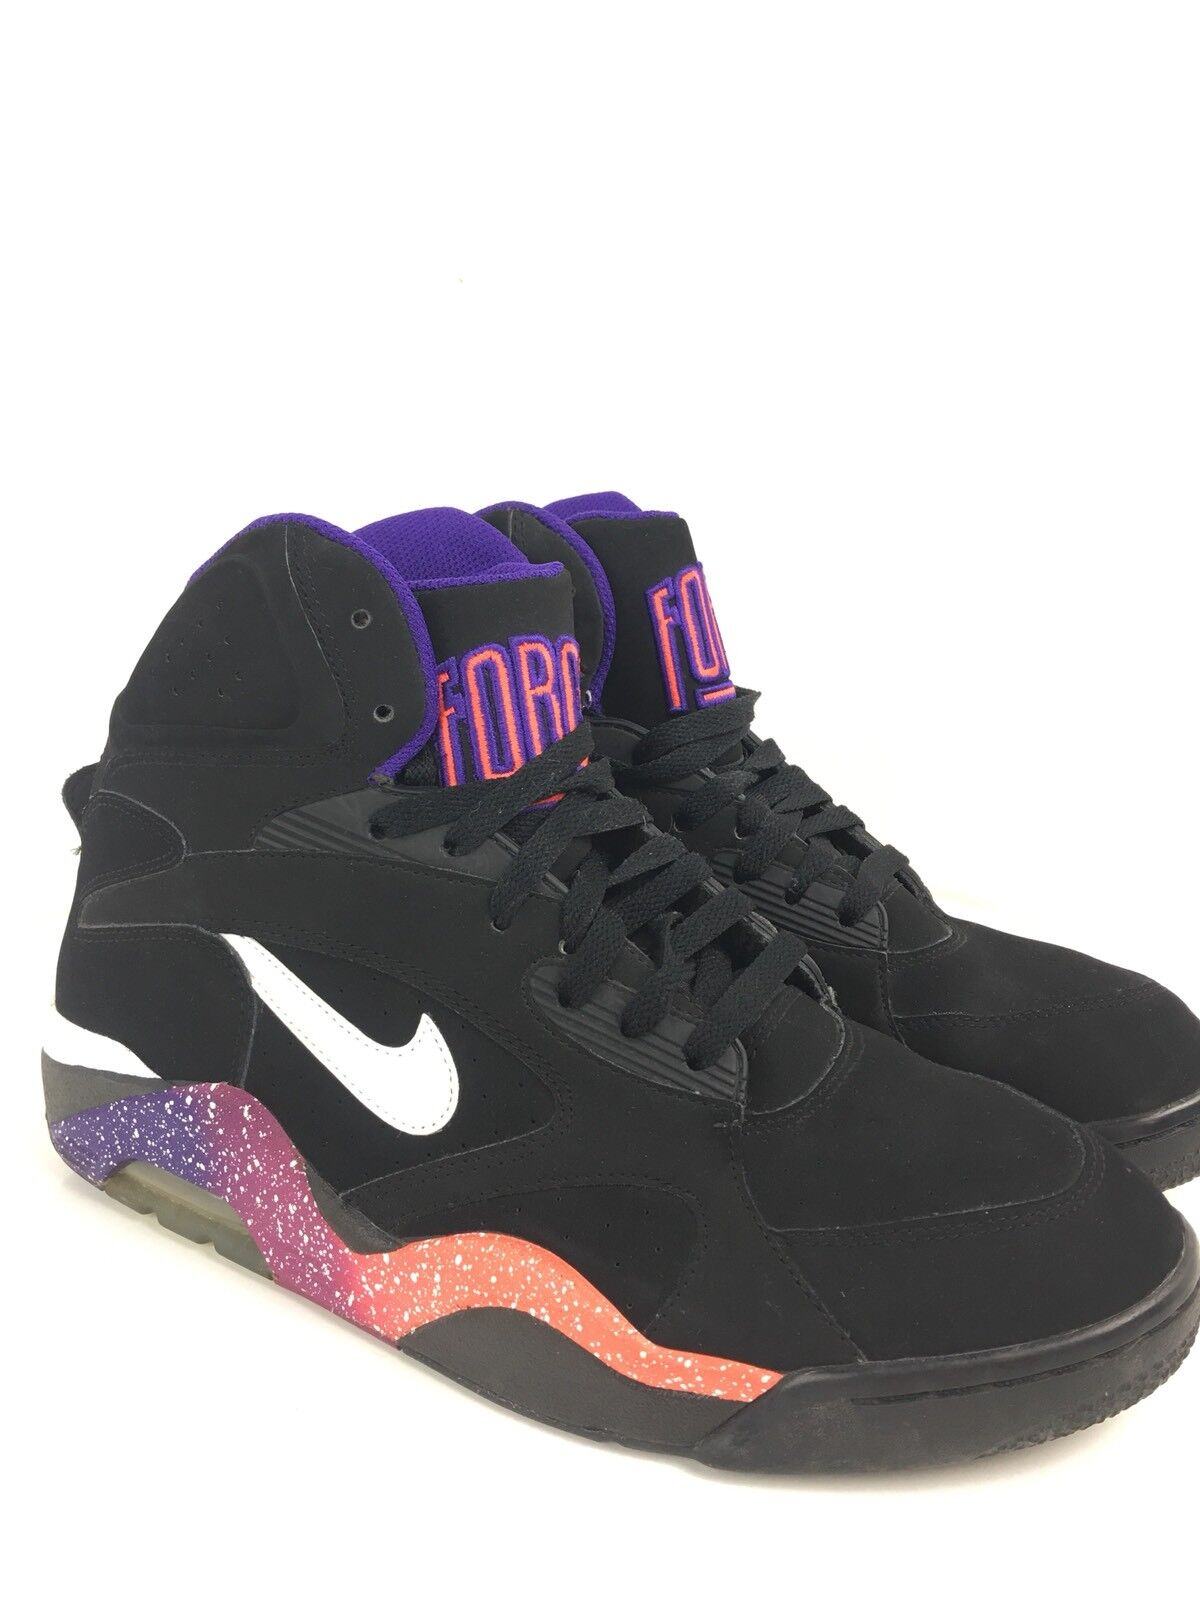 Nike Air Force 180 Mid Phoenix Suns Size 10.5. 537330-017 Jordan Barkley Sneaker